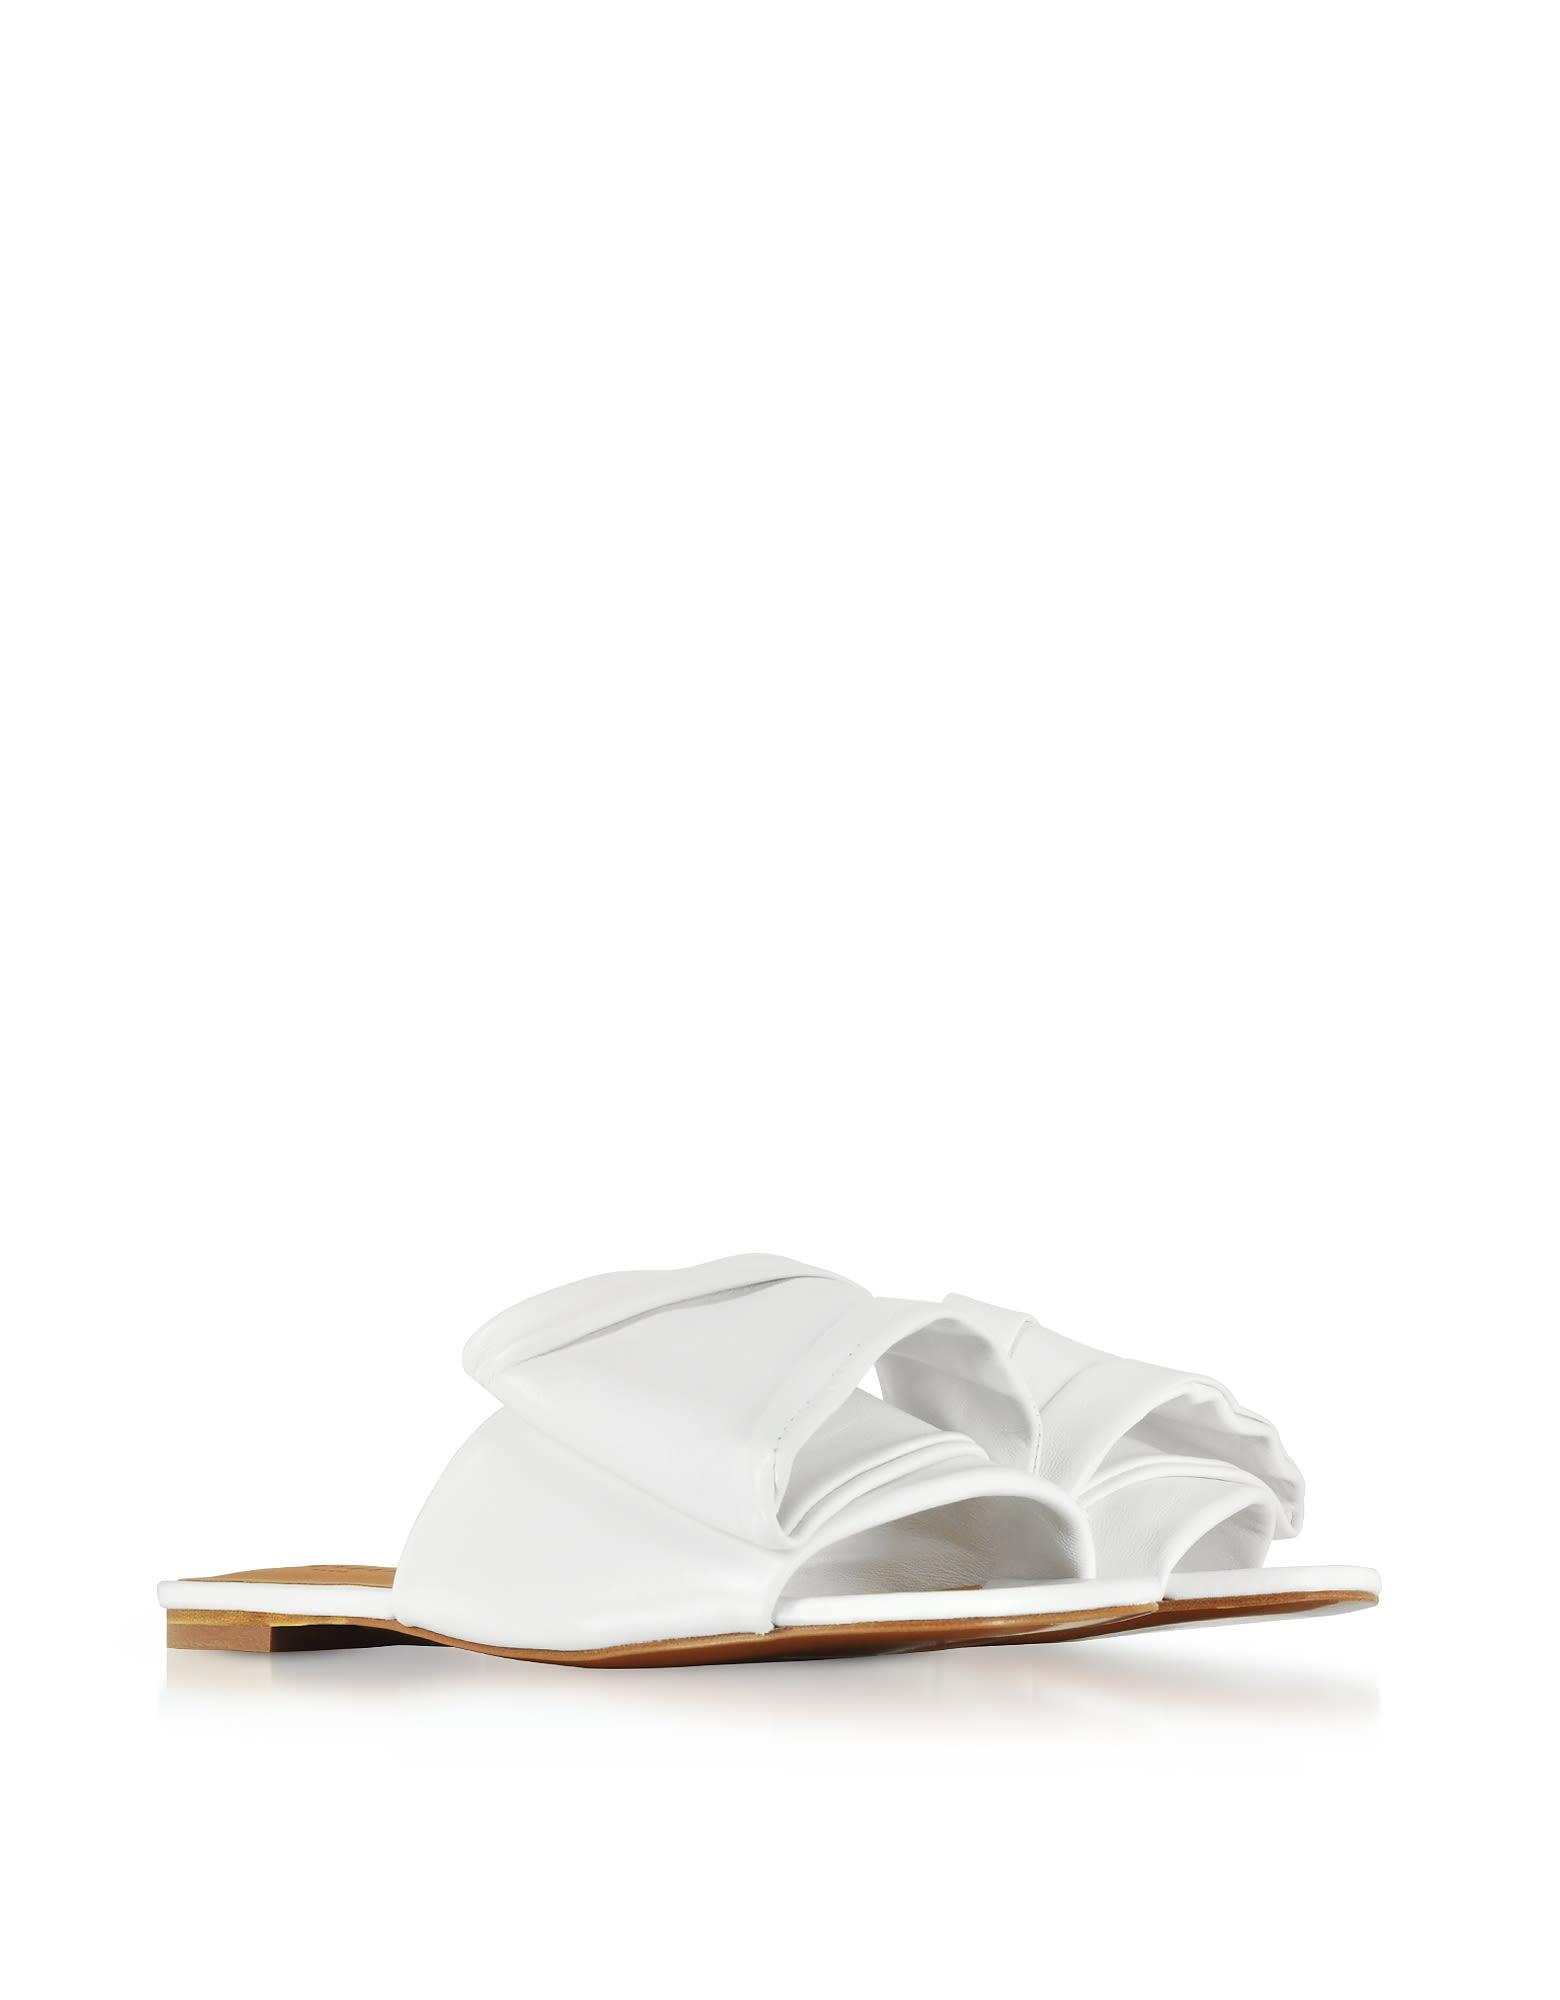 Robert Clergerie Designer Shoes, Igad Leather Flat Sandals